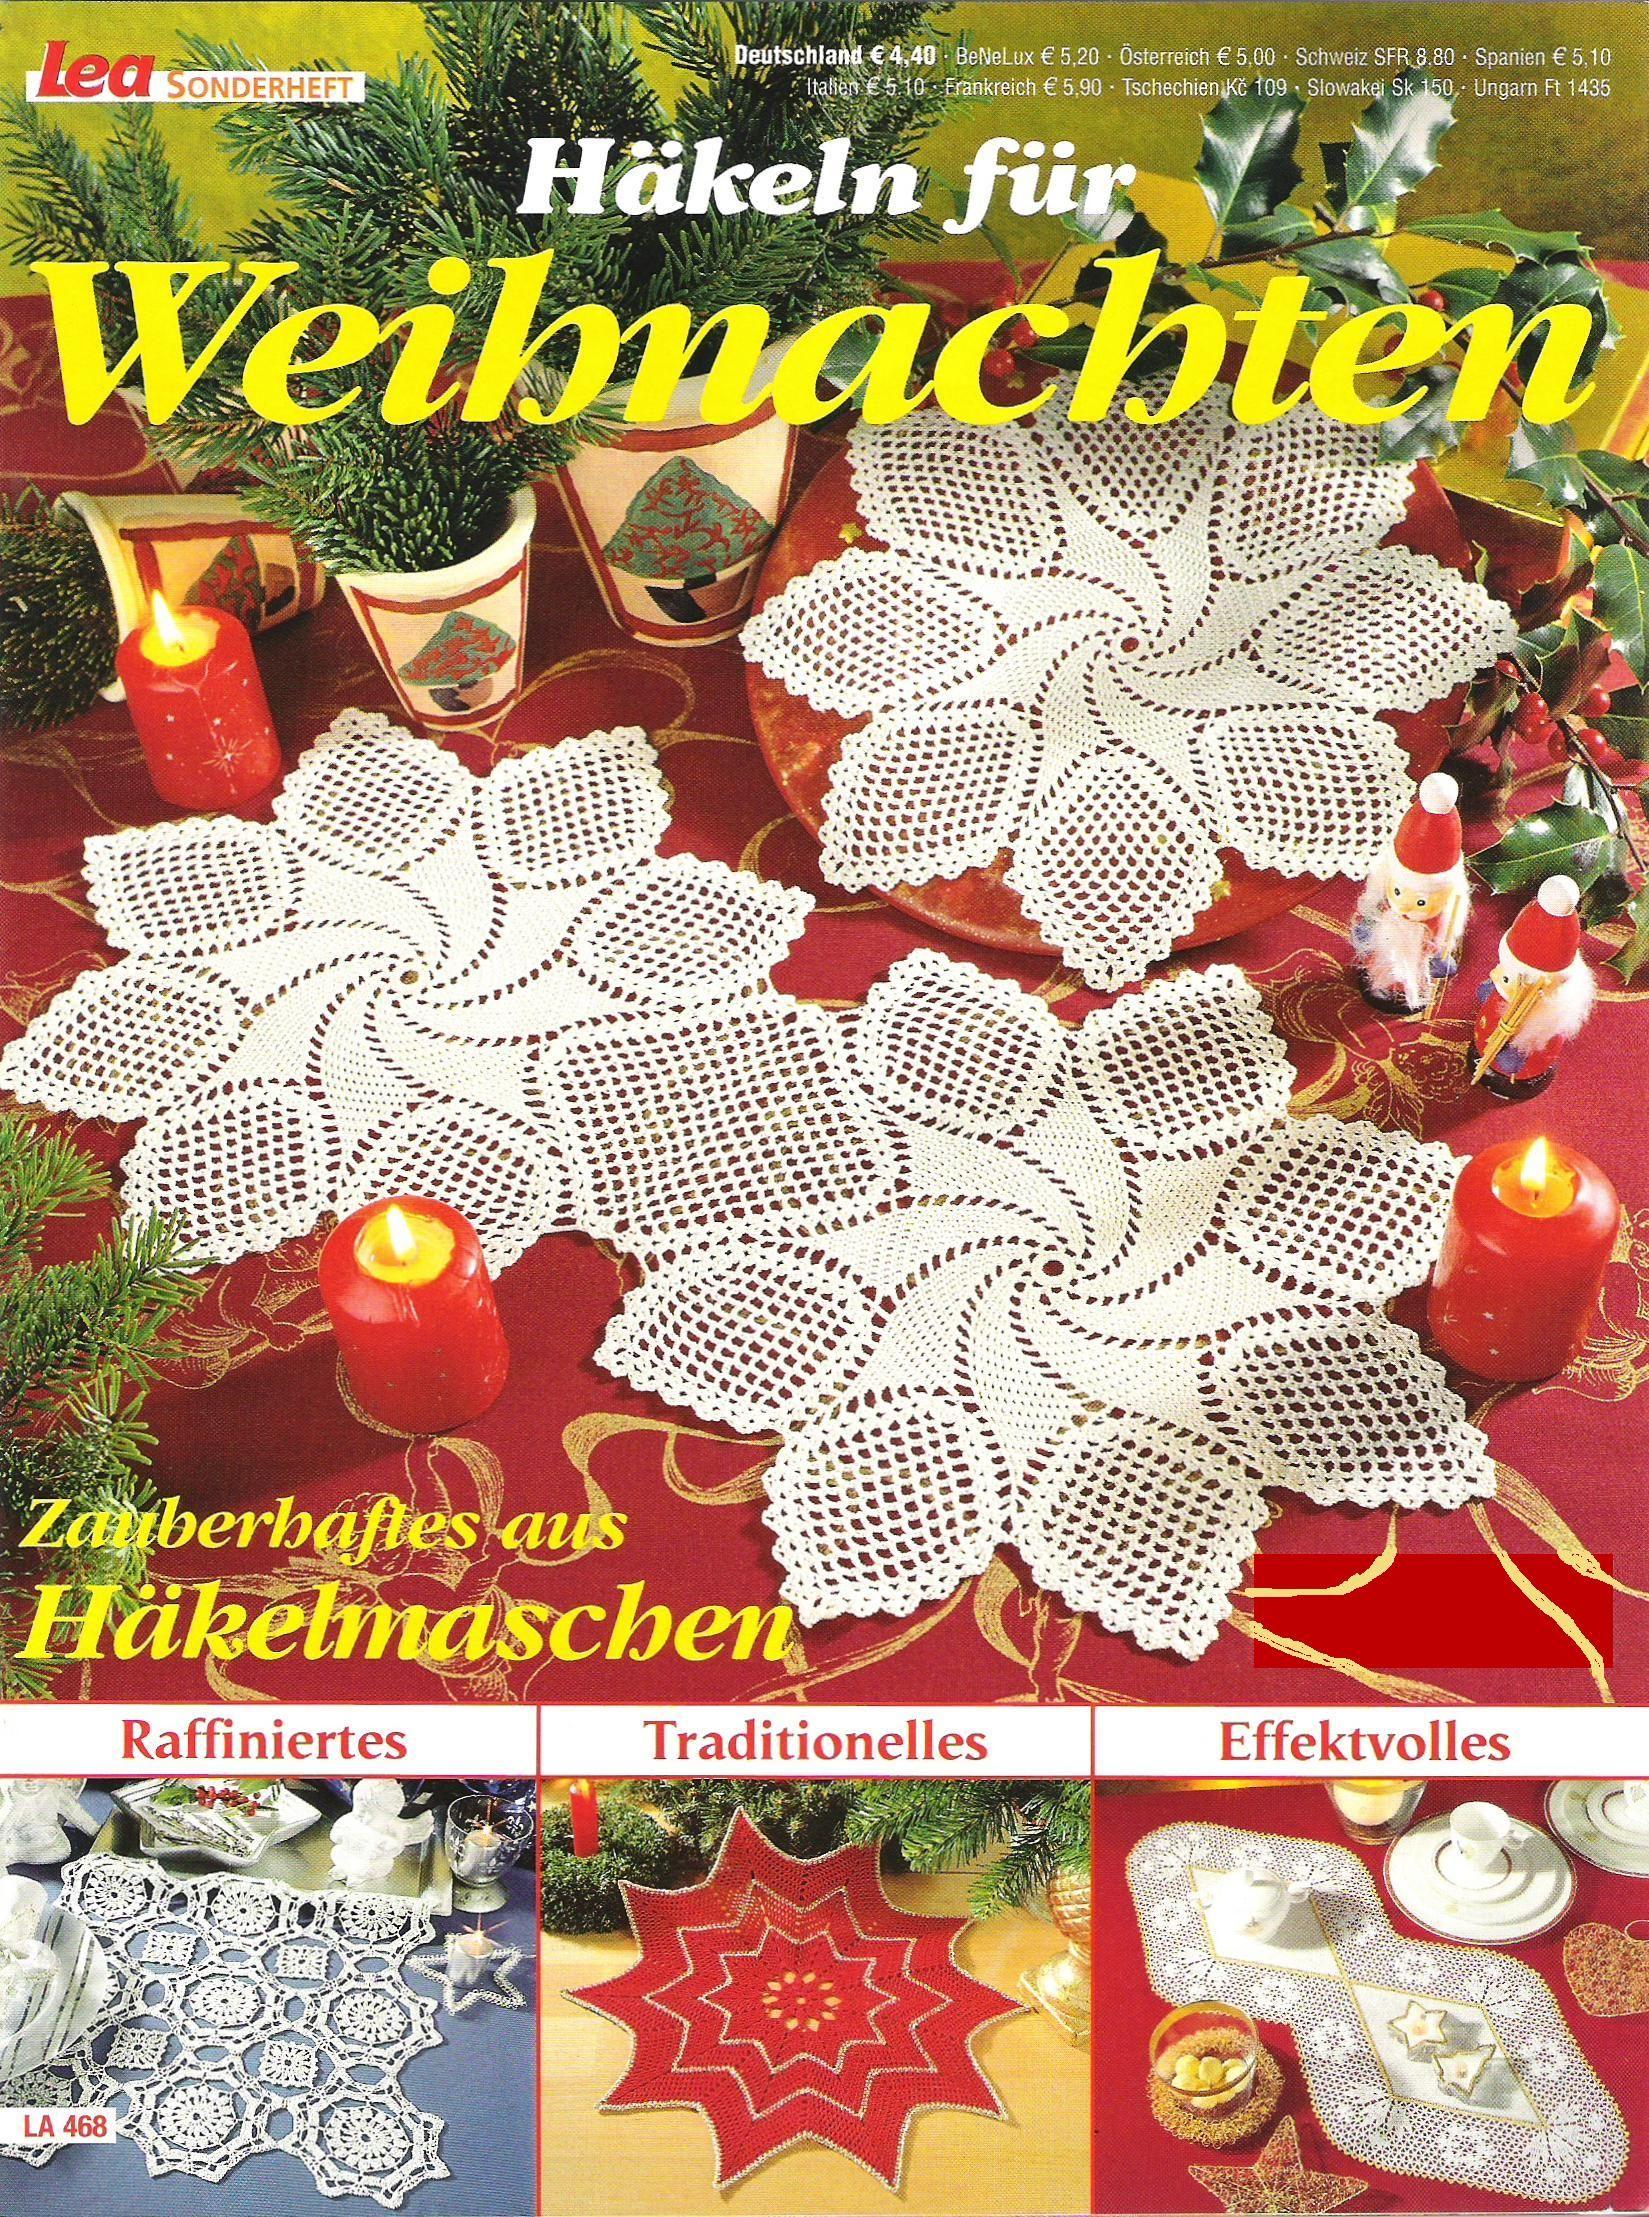 Салфеточки, шторки, скатерти… | Häkelzeitung | Pinterest | Deckchen ...